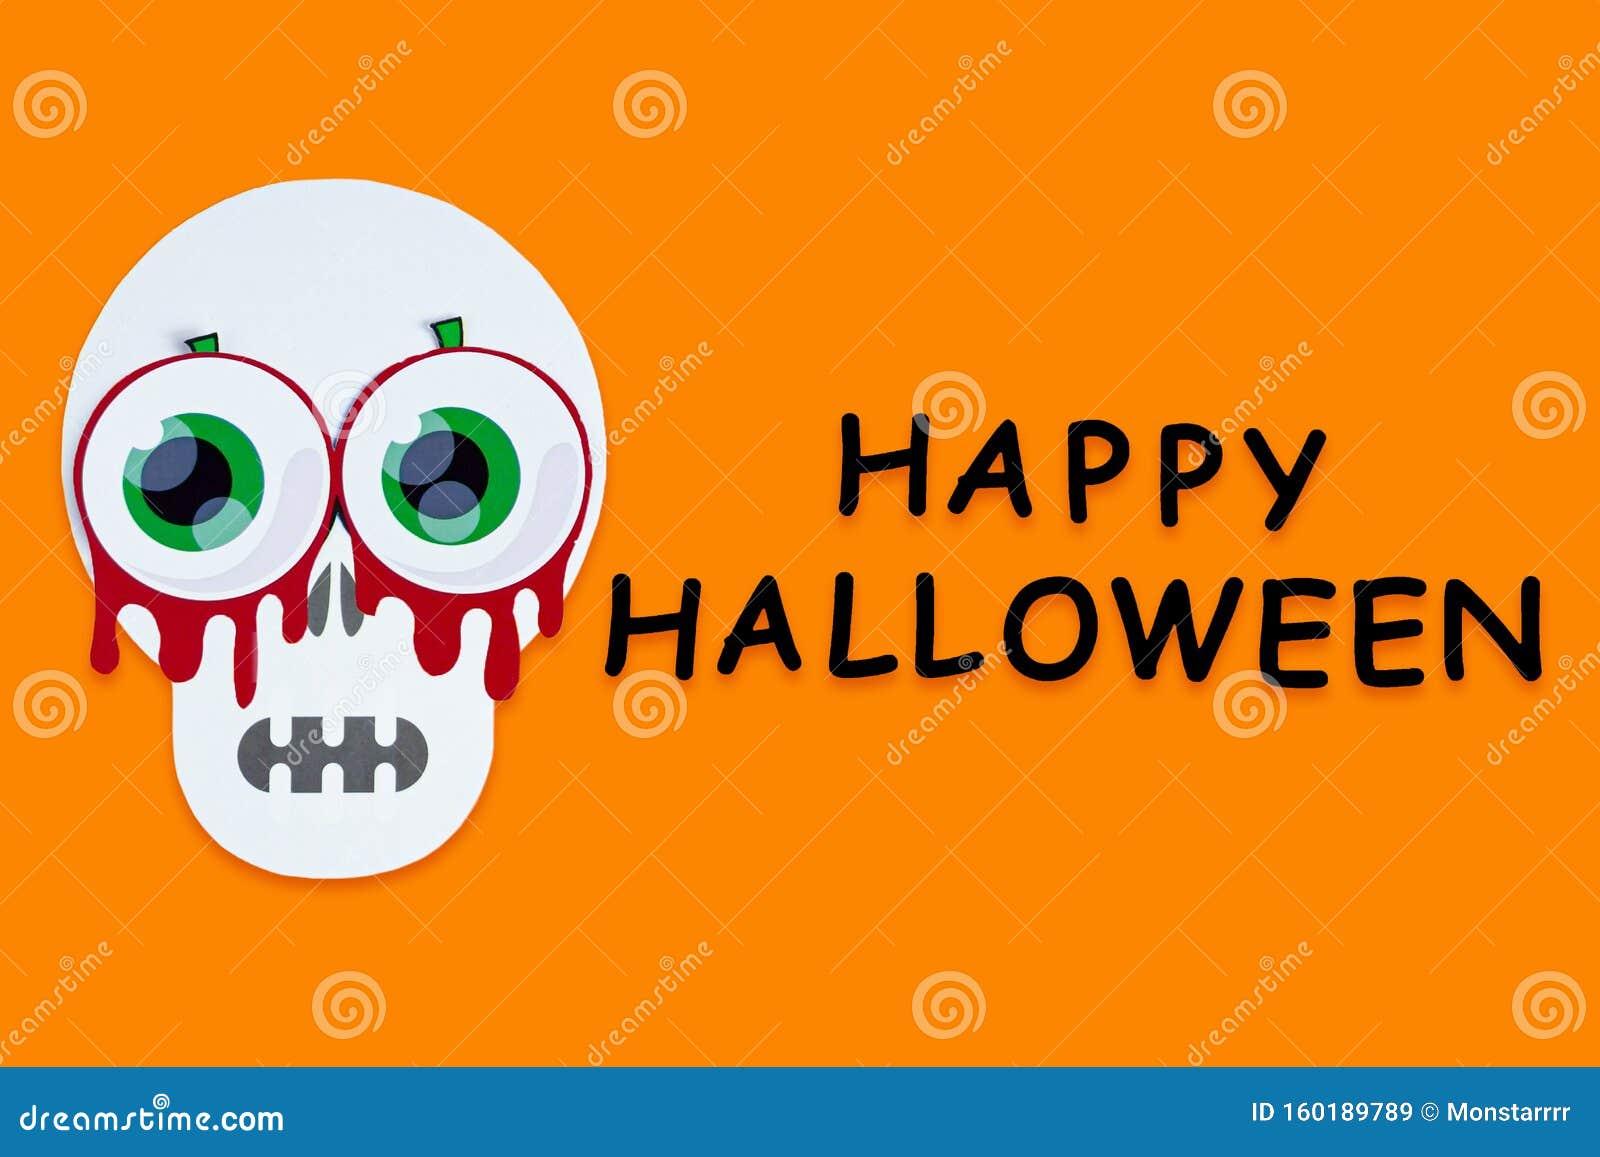 Orange Halloween Background With Halloween Props Stock Image